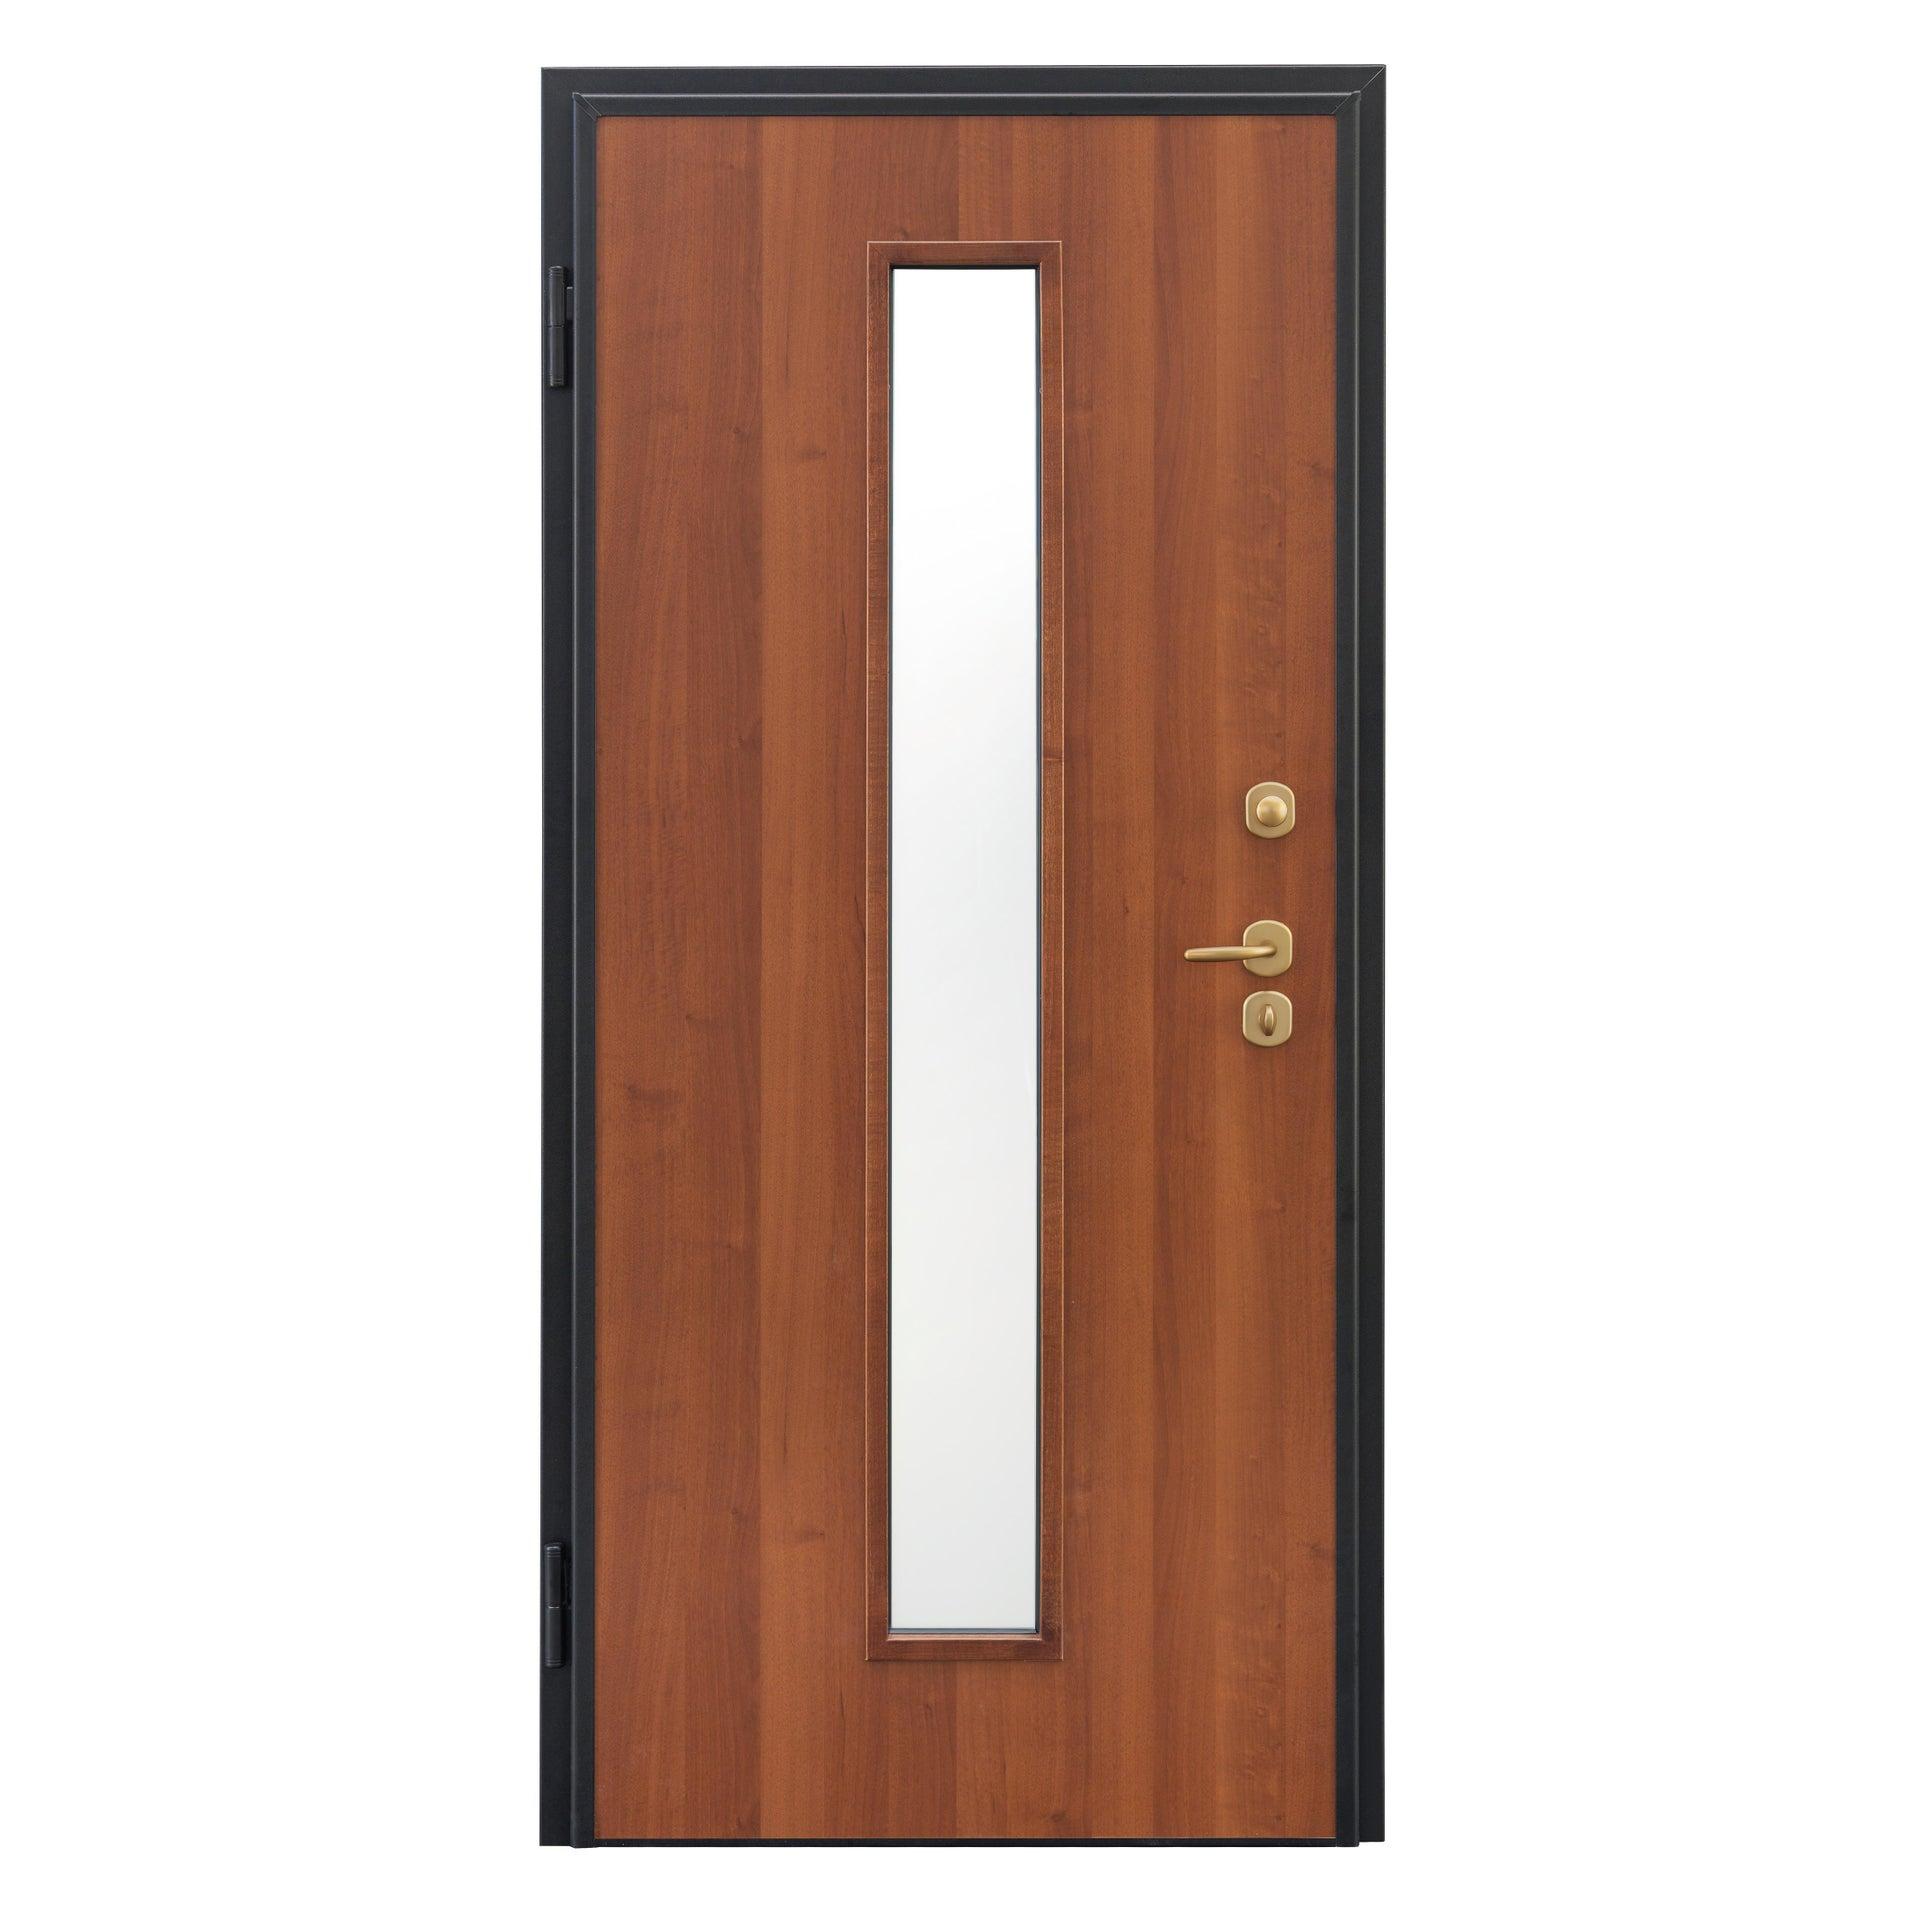 Porta blindata Mirror noce L 90 x H 210 cm destra - 9